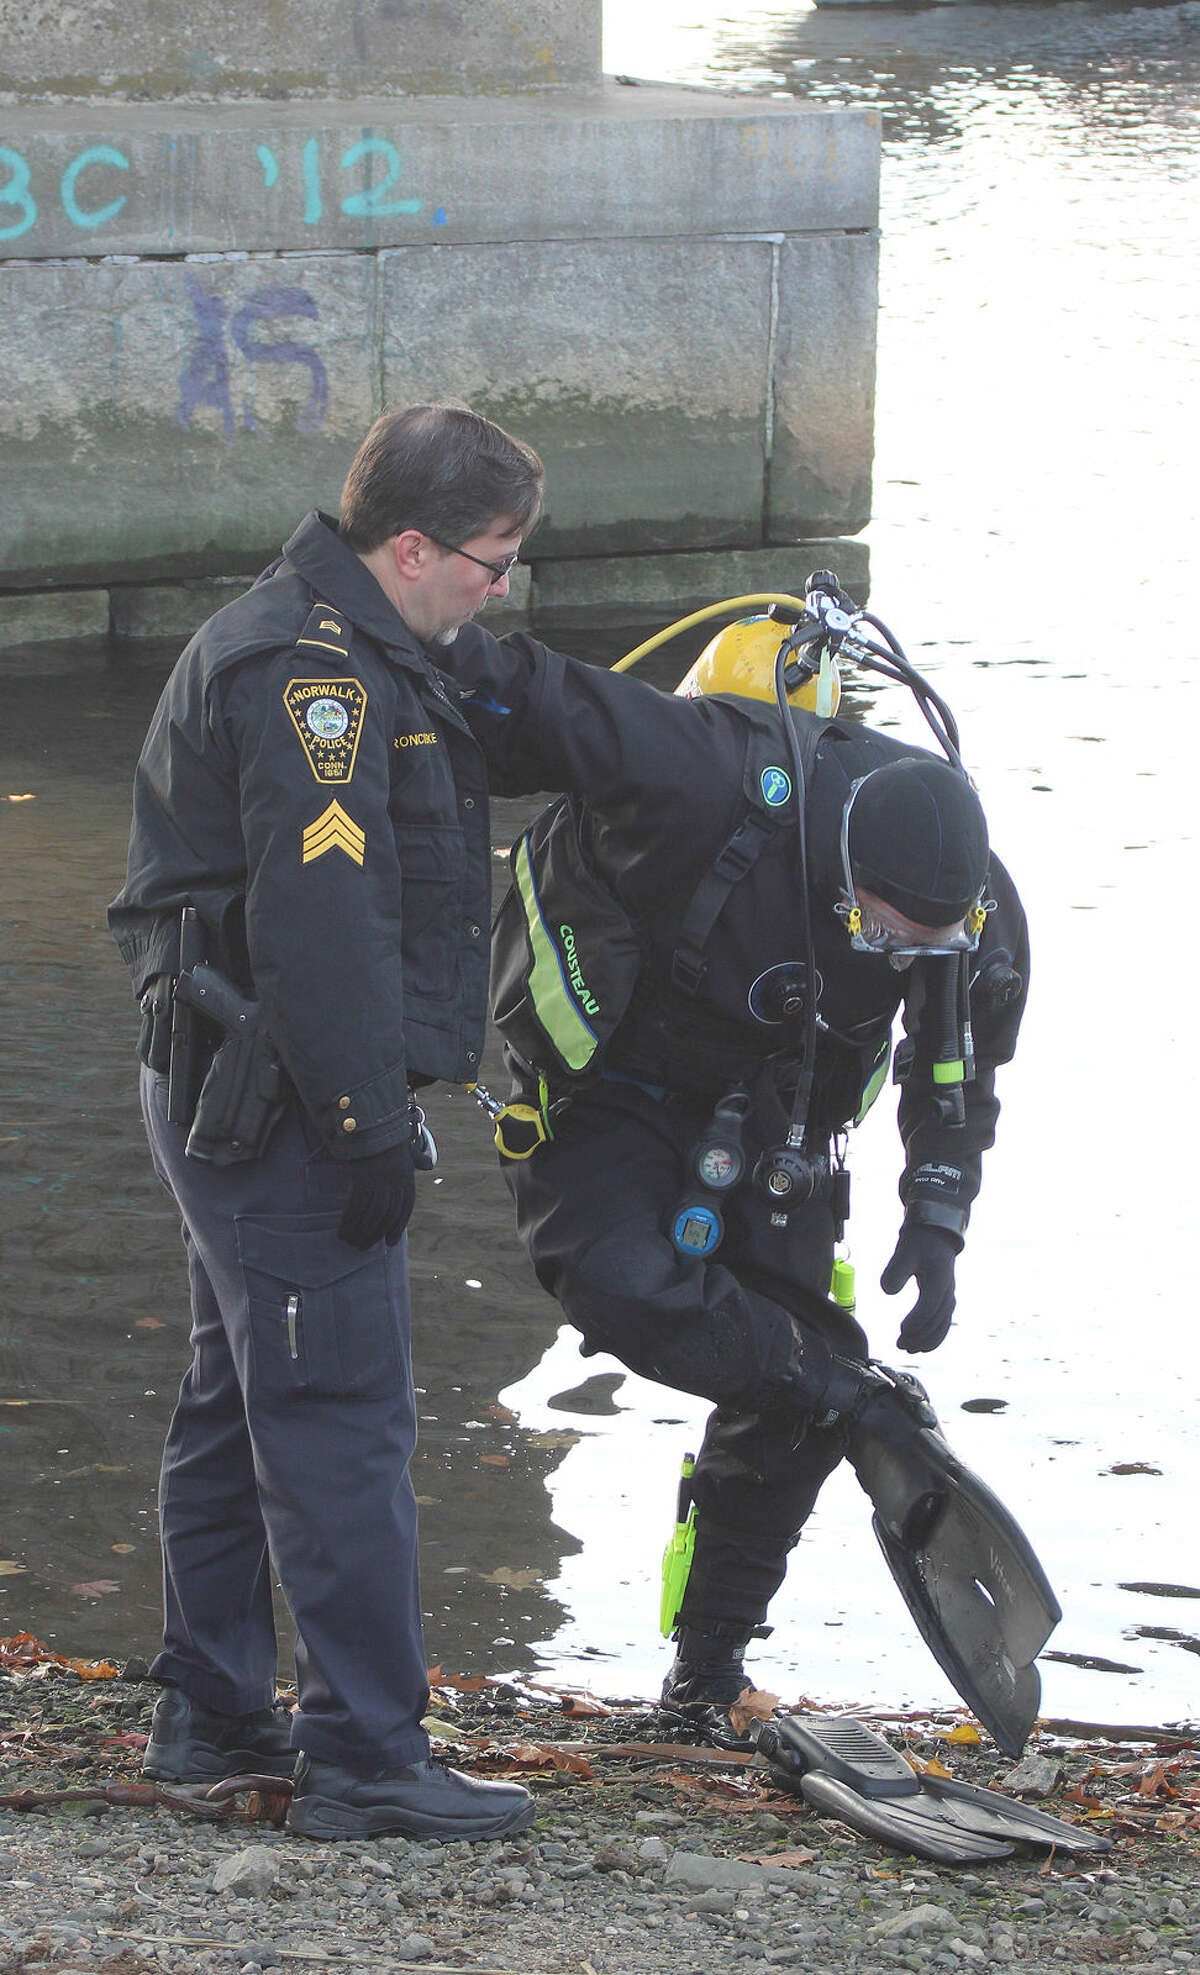 Hour photo/Chris Bosak Thomas Roncinske helps Norwalk Police officer Bruce Lovallo during a diving training session held Thurday in the Norwalk River.